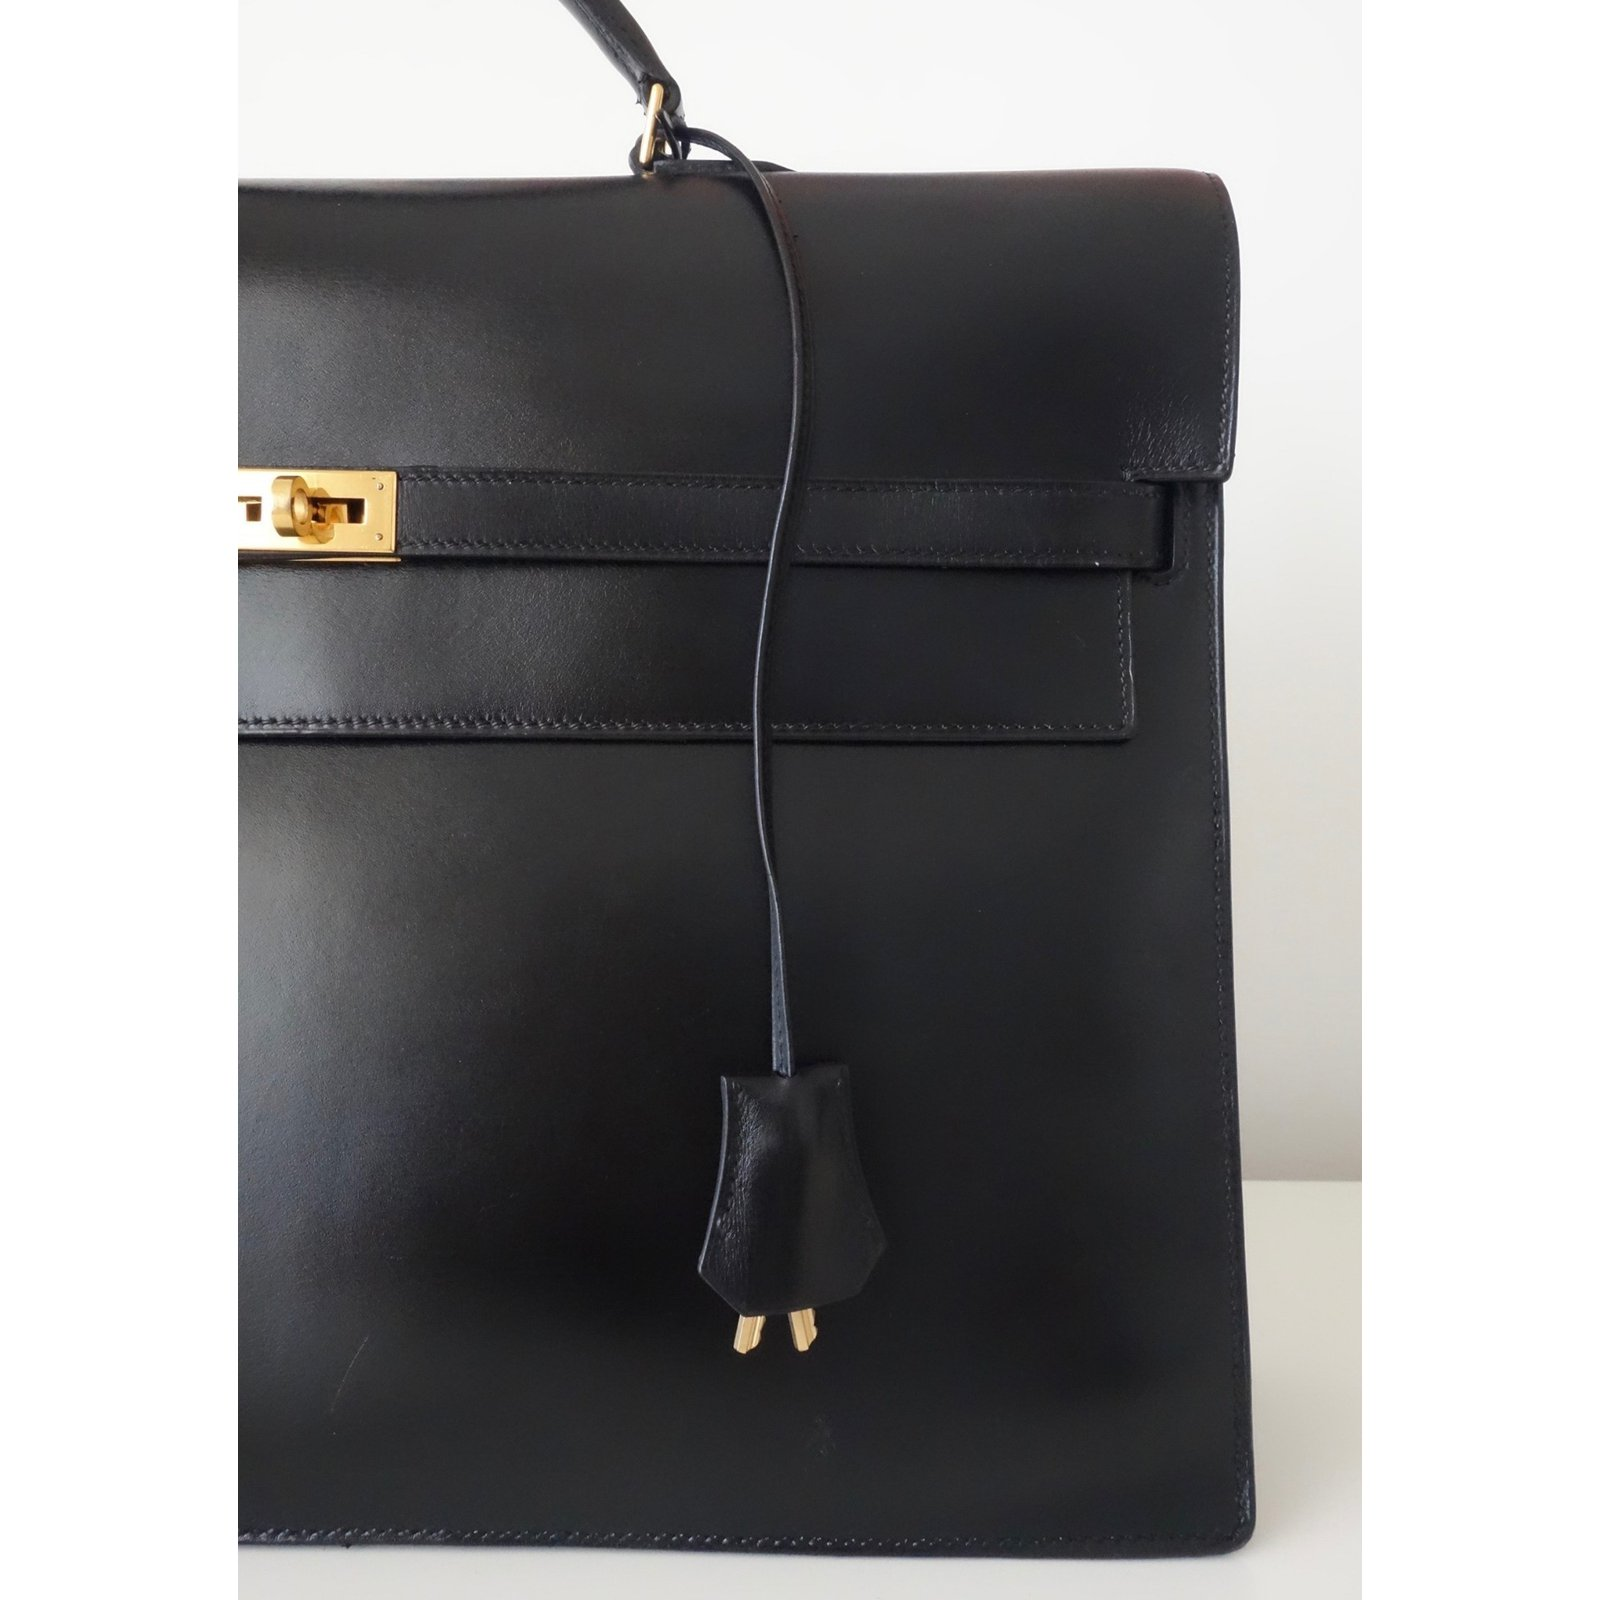 15b340d0a57 uk sacs à main hermès sac a depeches kelly cuir noir ref.66561 joli closet